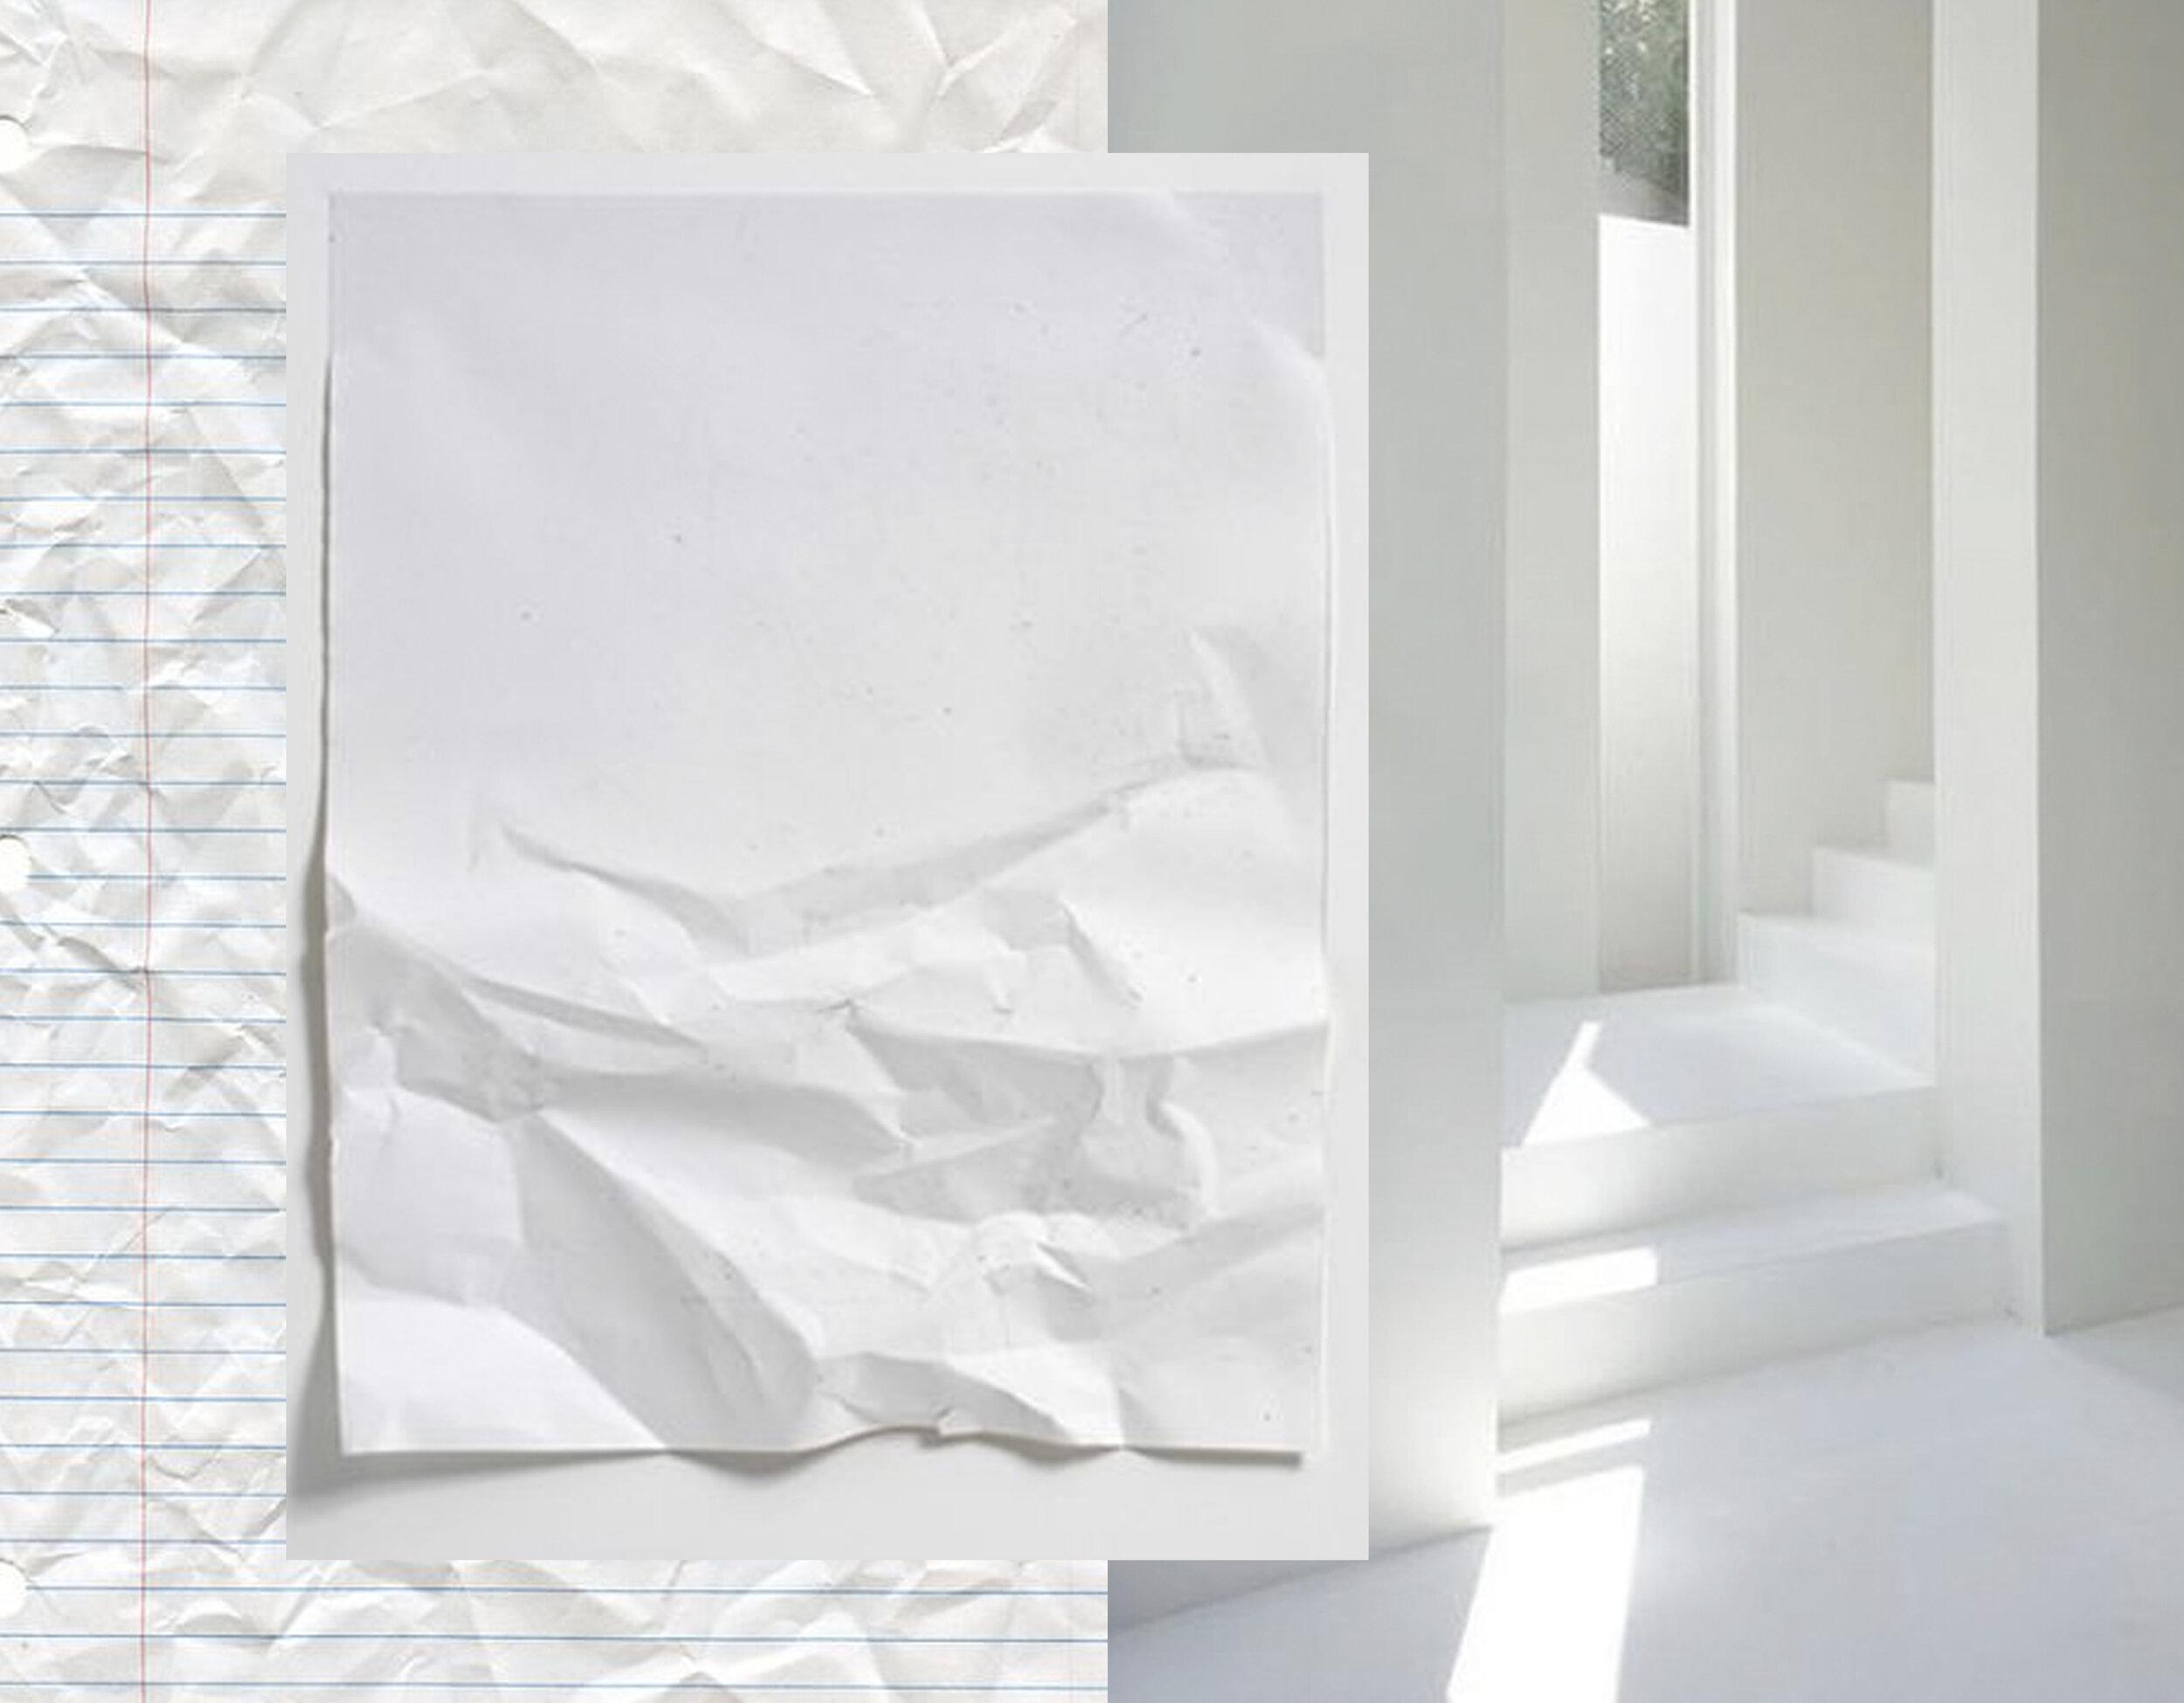 crumpled looseleaf paper  Cliffski  - crumpled white paper Winter Series  Stephen Antonakos  - white room via  Ultralinx